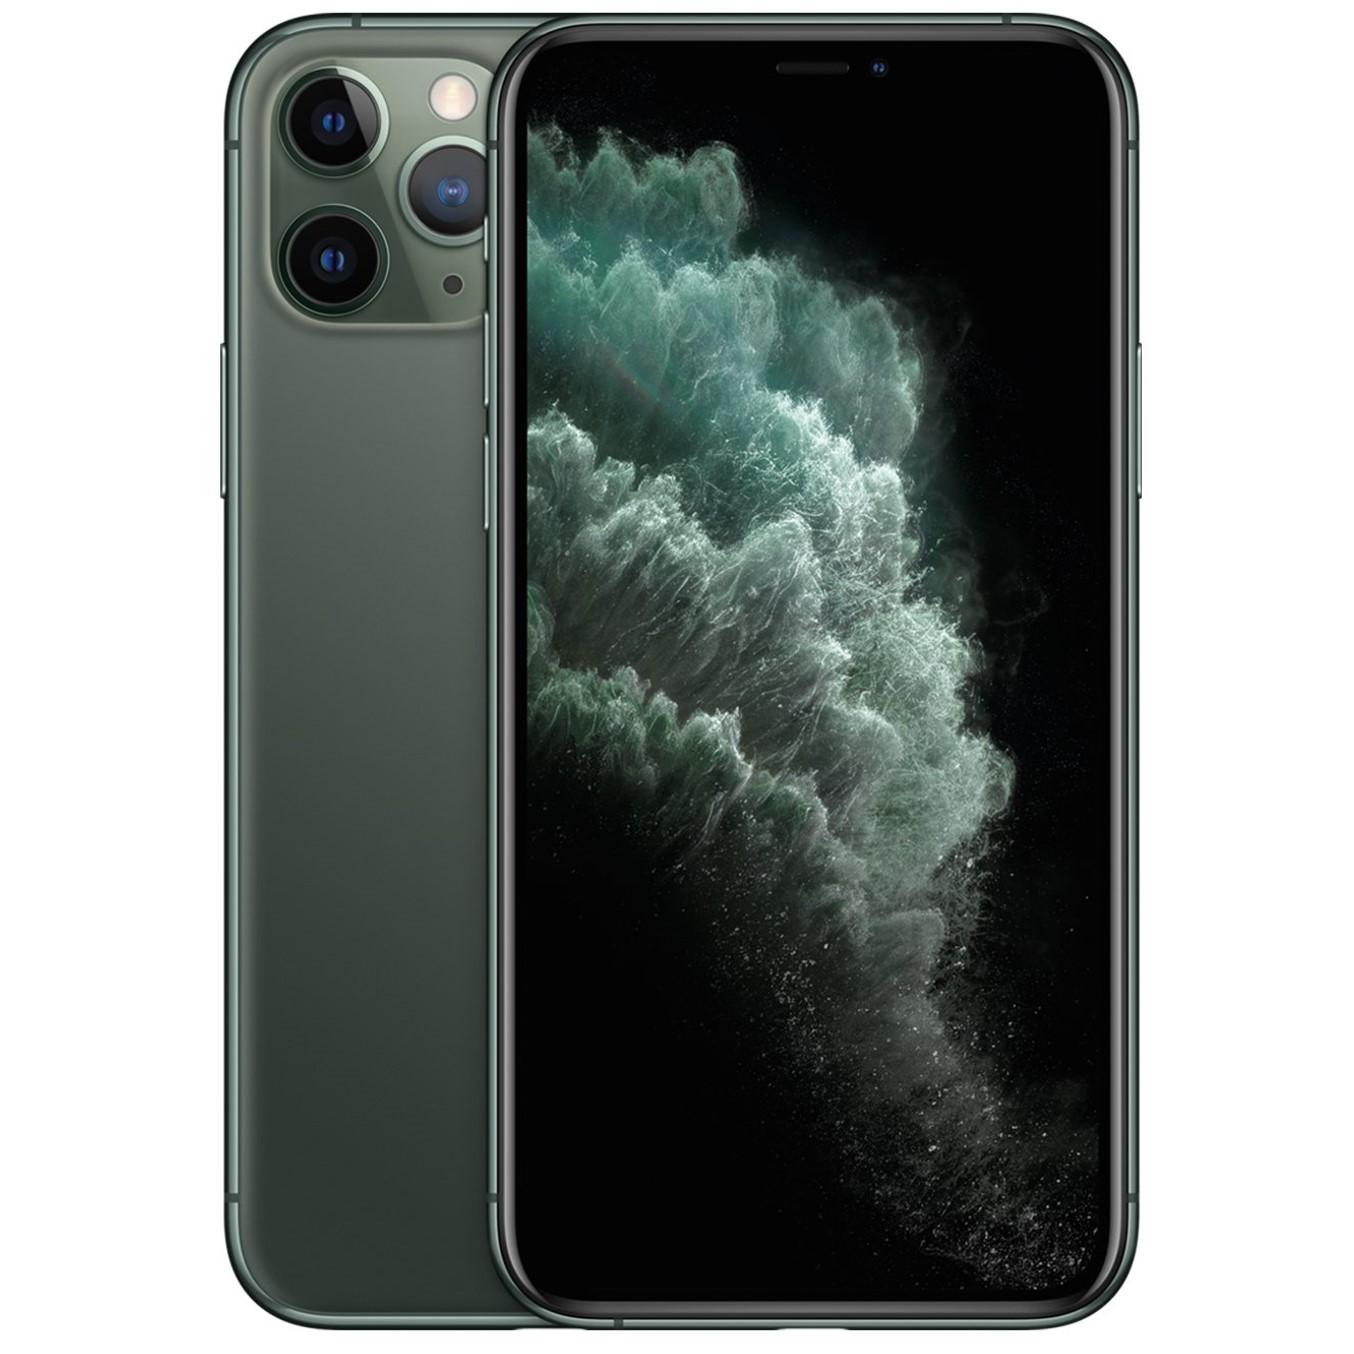 Telefono movil smartphone apple iphone 11 pro 64gb midnight green - 5.8pulgadas - dual sim - triple camara trasera